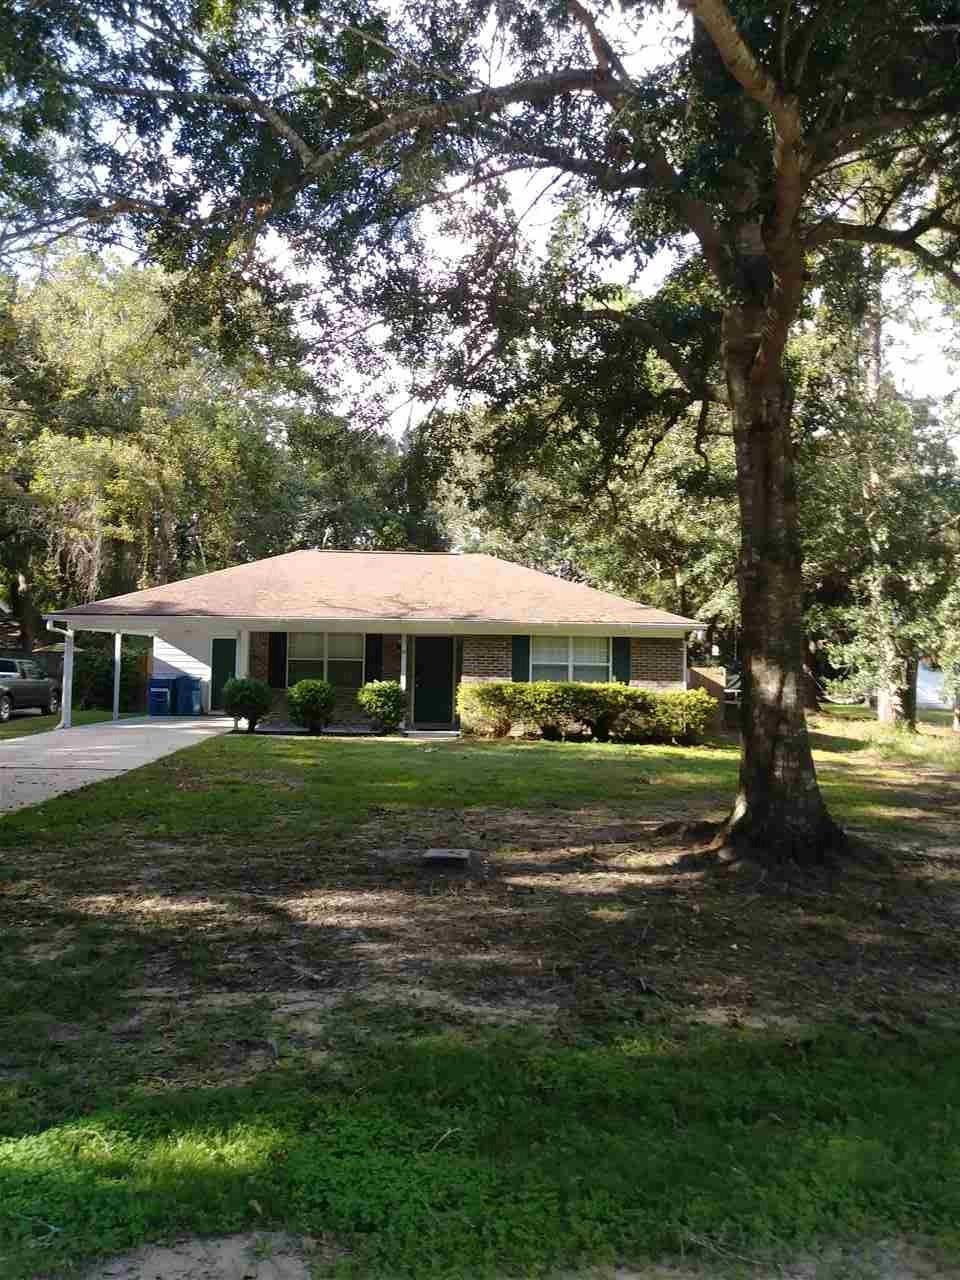 1028 E 22nd Avenue, Gulf Shores, AL 36542 (MLS #274406) :: Gulf Coast  Experts Real Estate Team